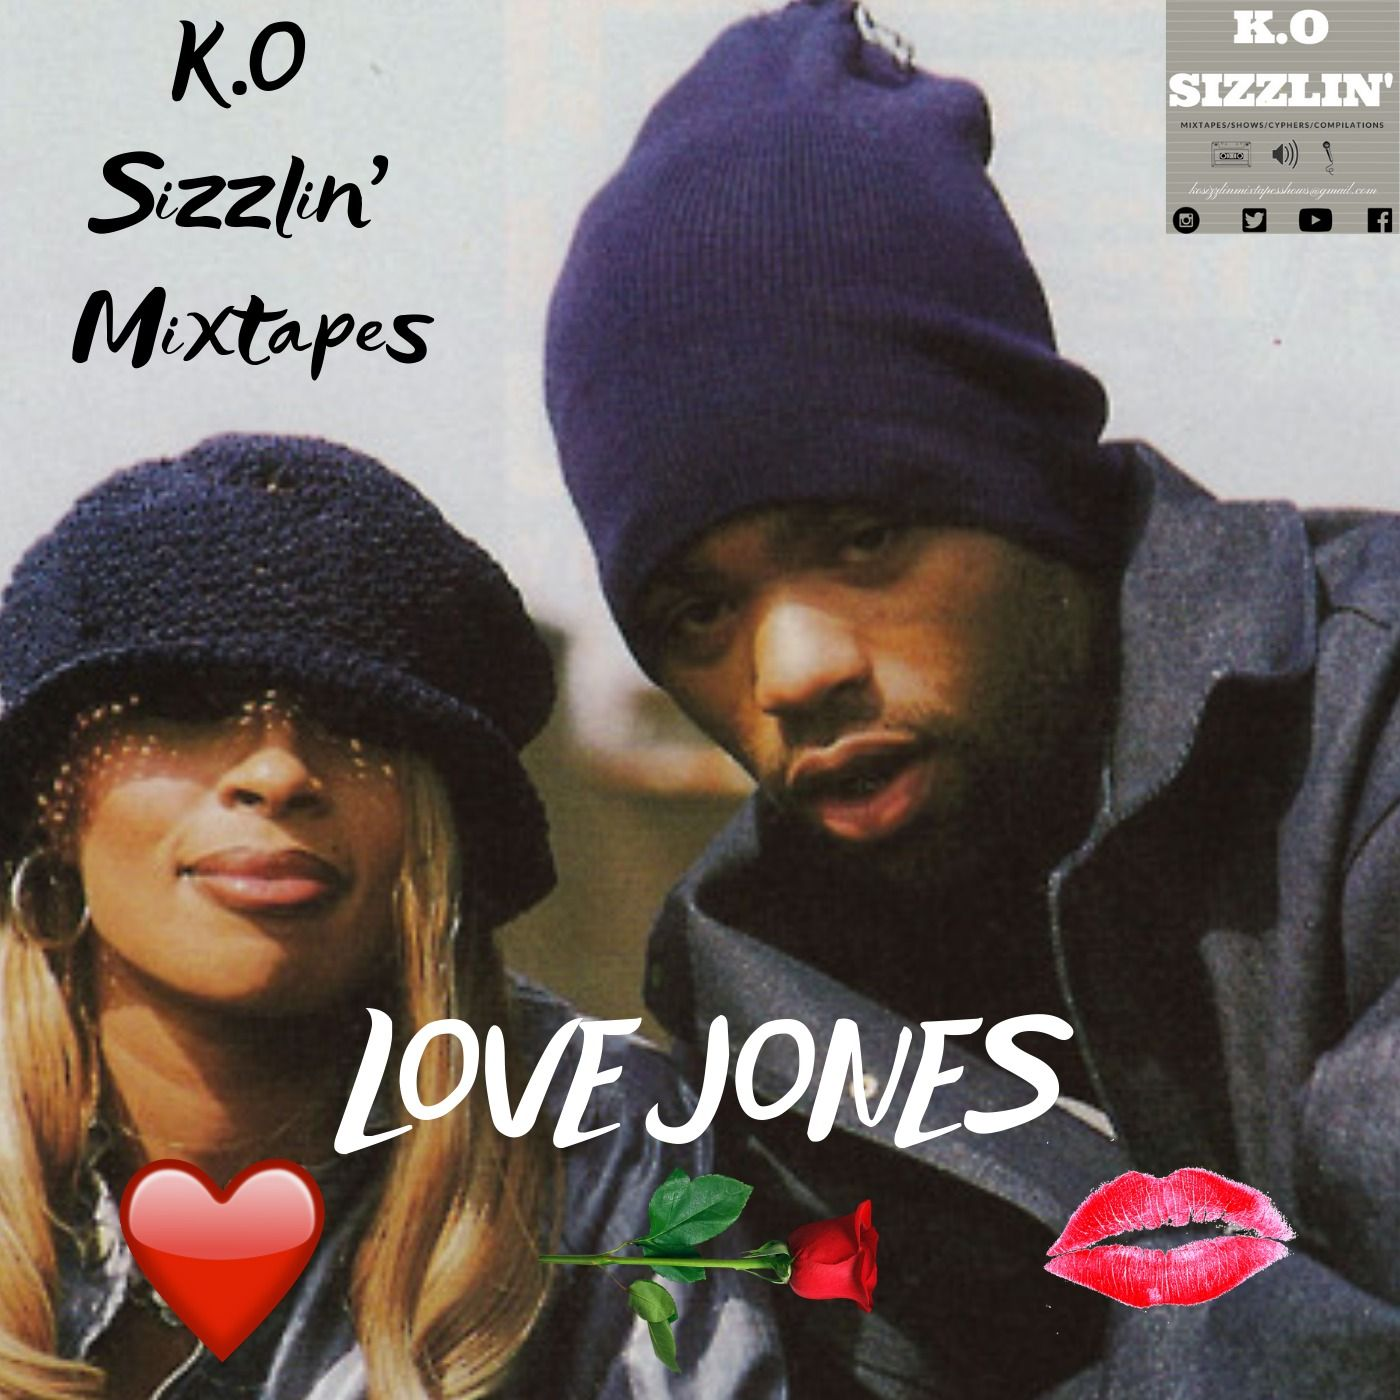 K O Sizzlin' Mixtapes - 12  Lotto Savage ft YFN Lucci - All